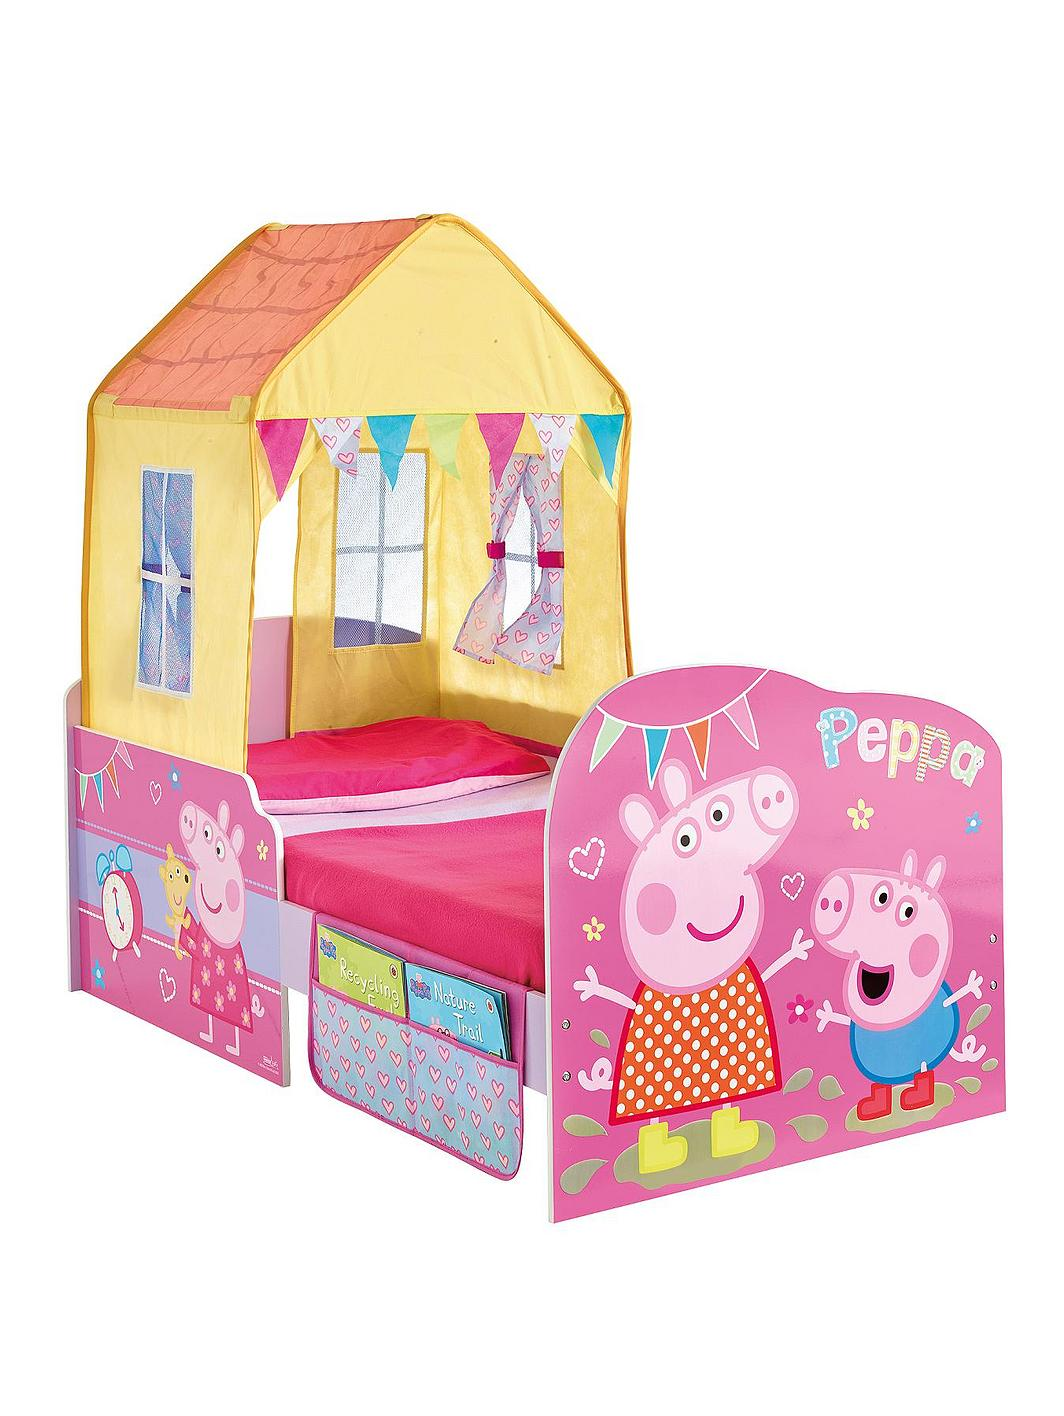 Peppa Pig Toddler Bedding 28 Images Nickelodeon Peppa